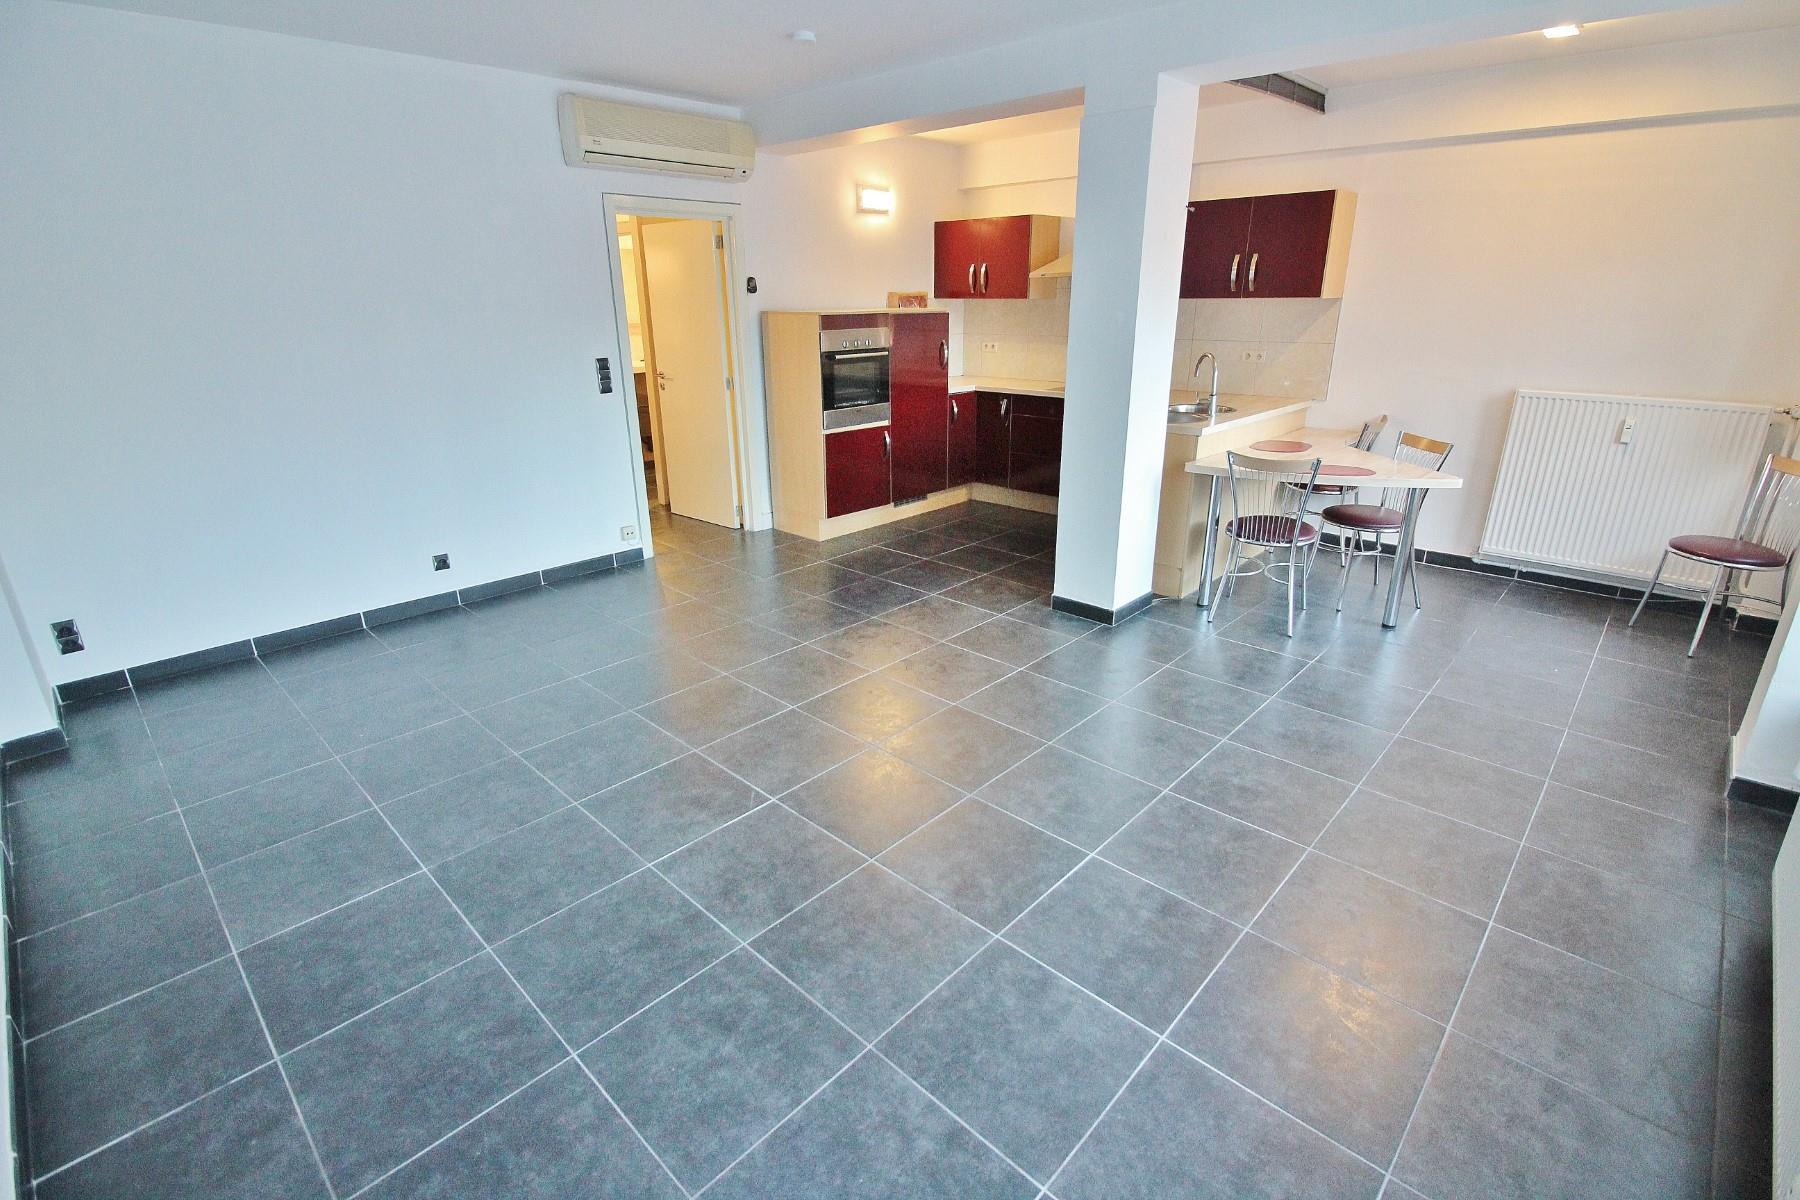 Appartement - Liège - #3337126-1